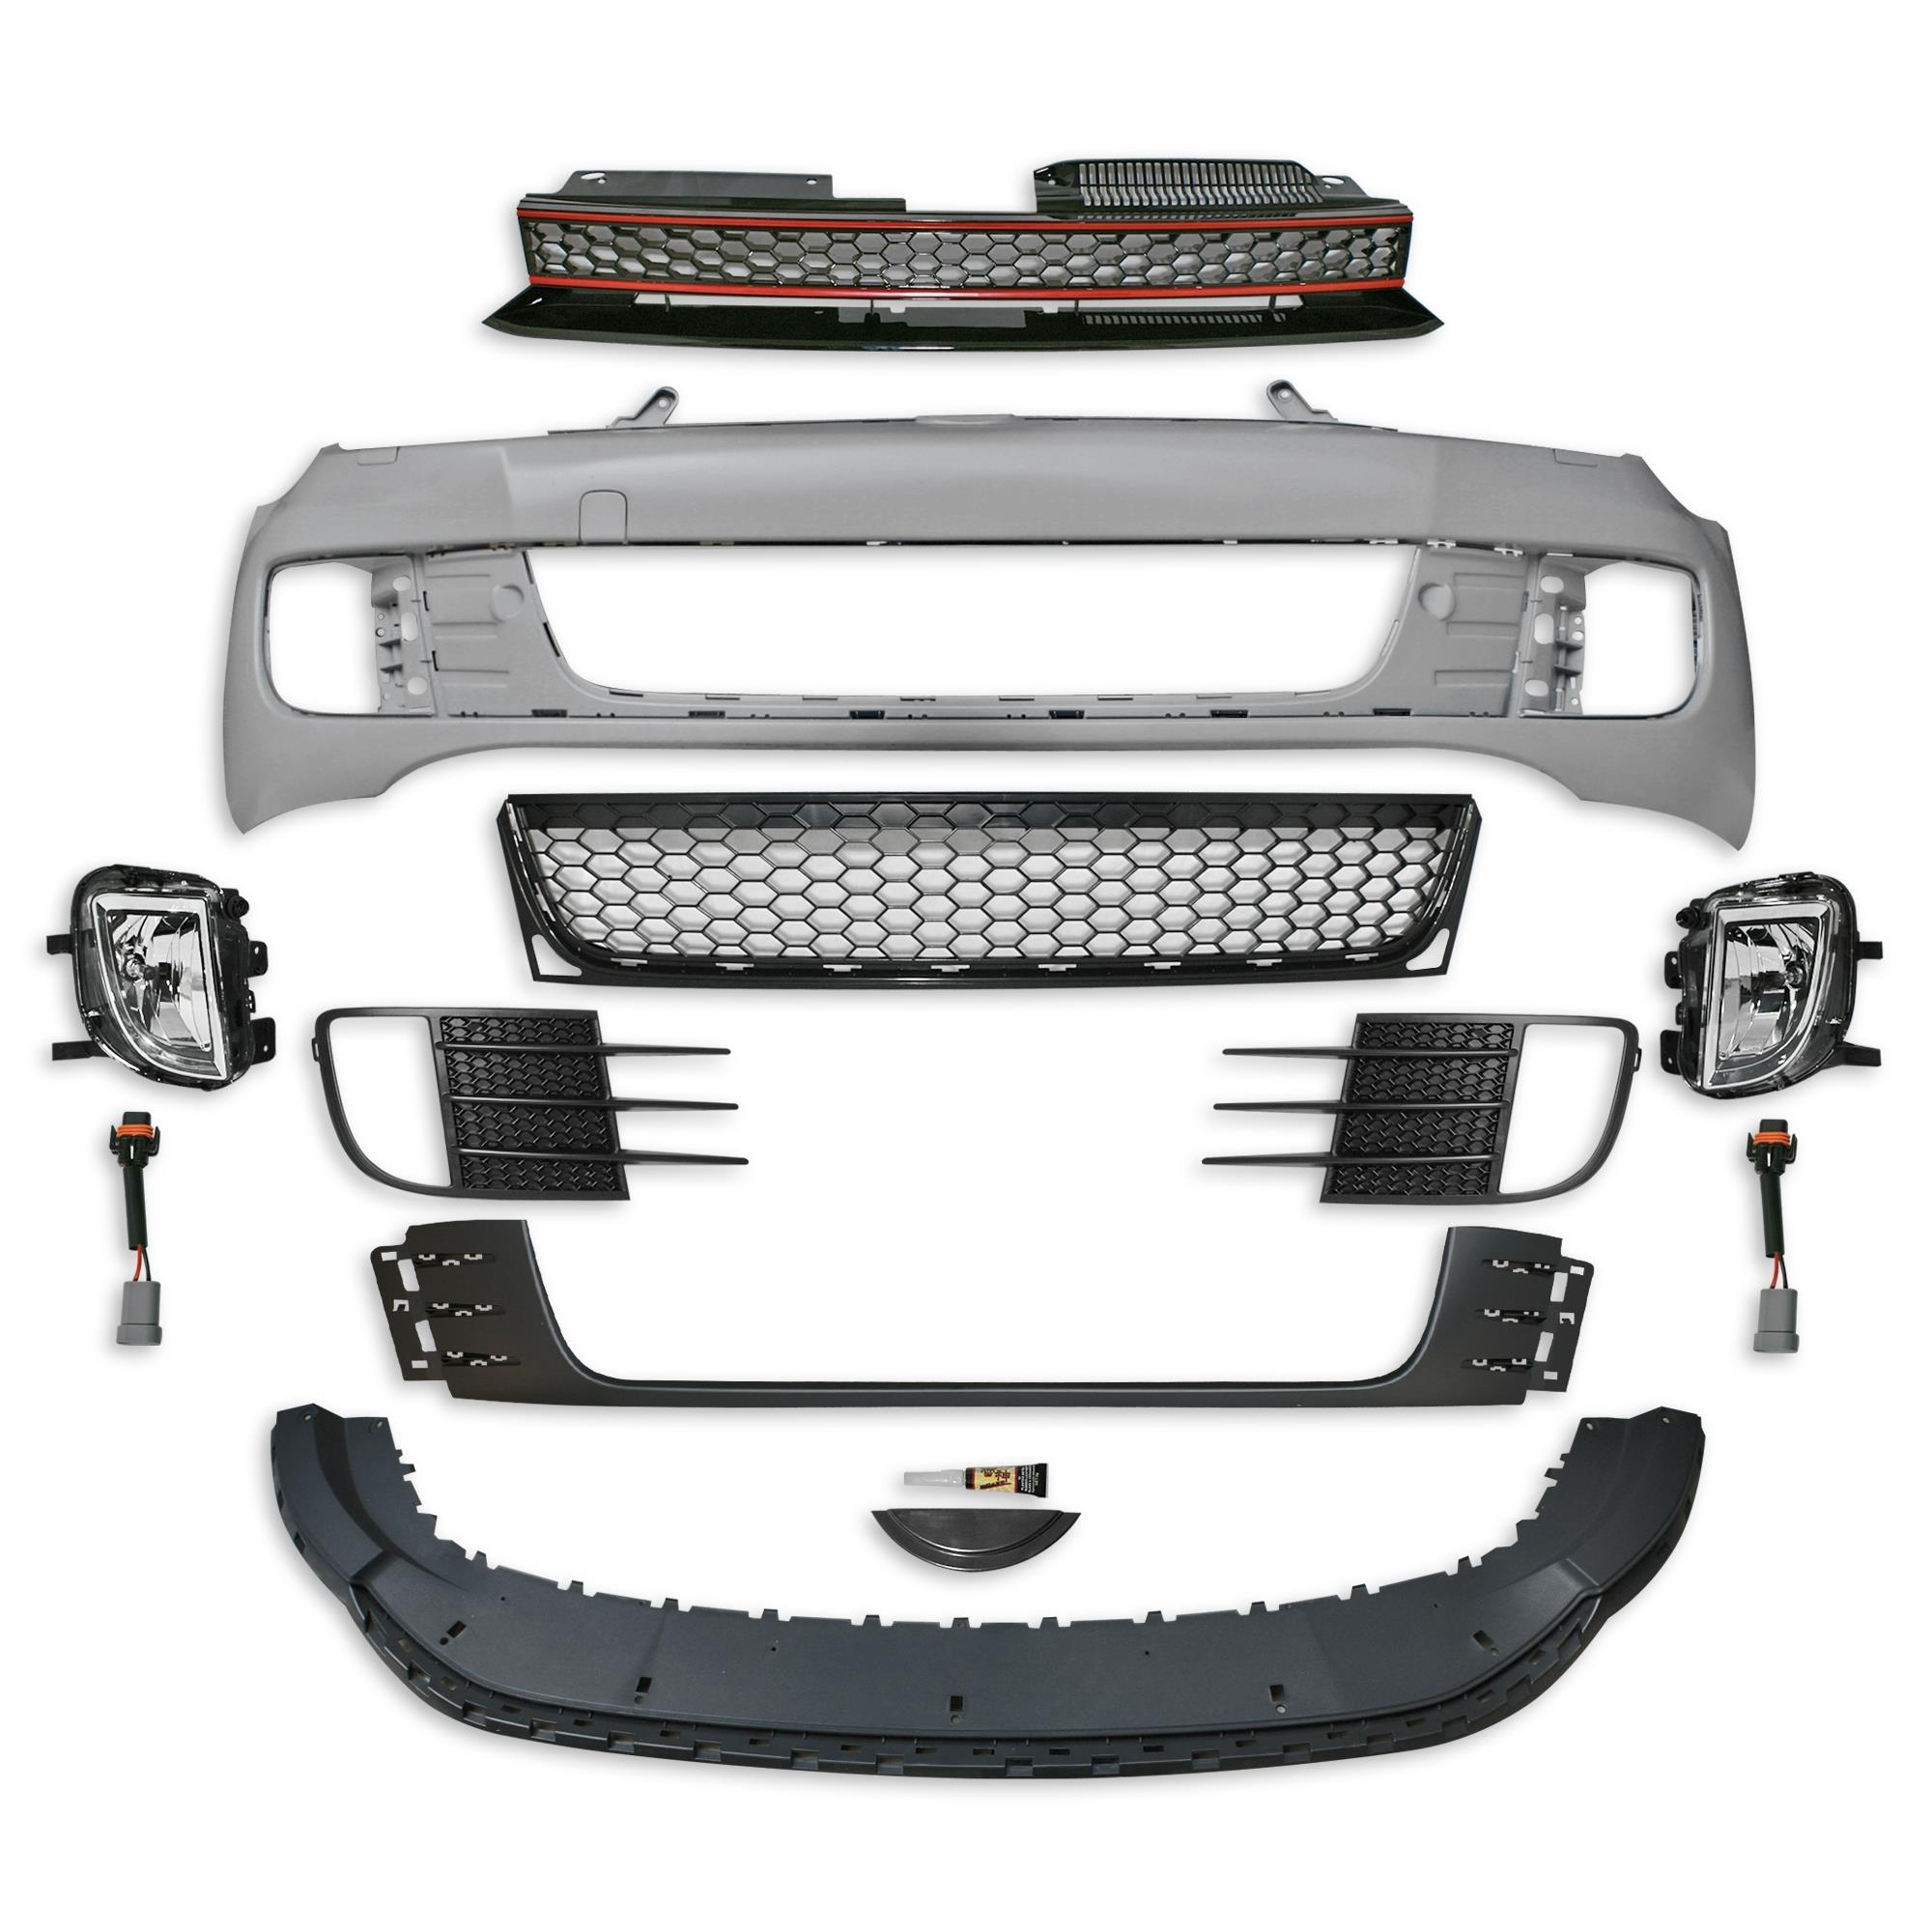 Voorbumper | VW Golf 6 VI 2008-2012 | GTI - Look | Bumper met grille | ABS Kunststof